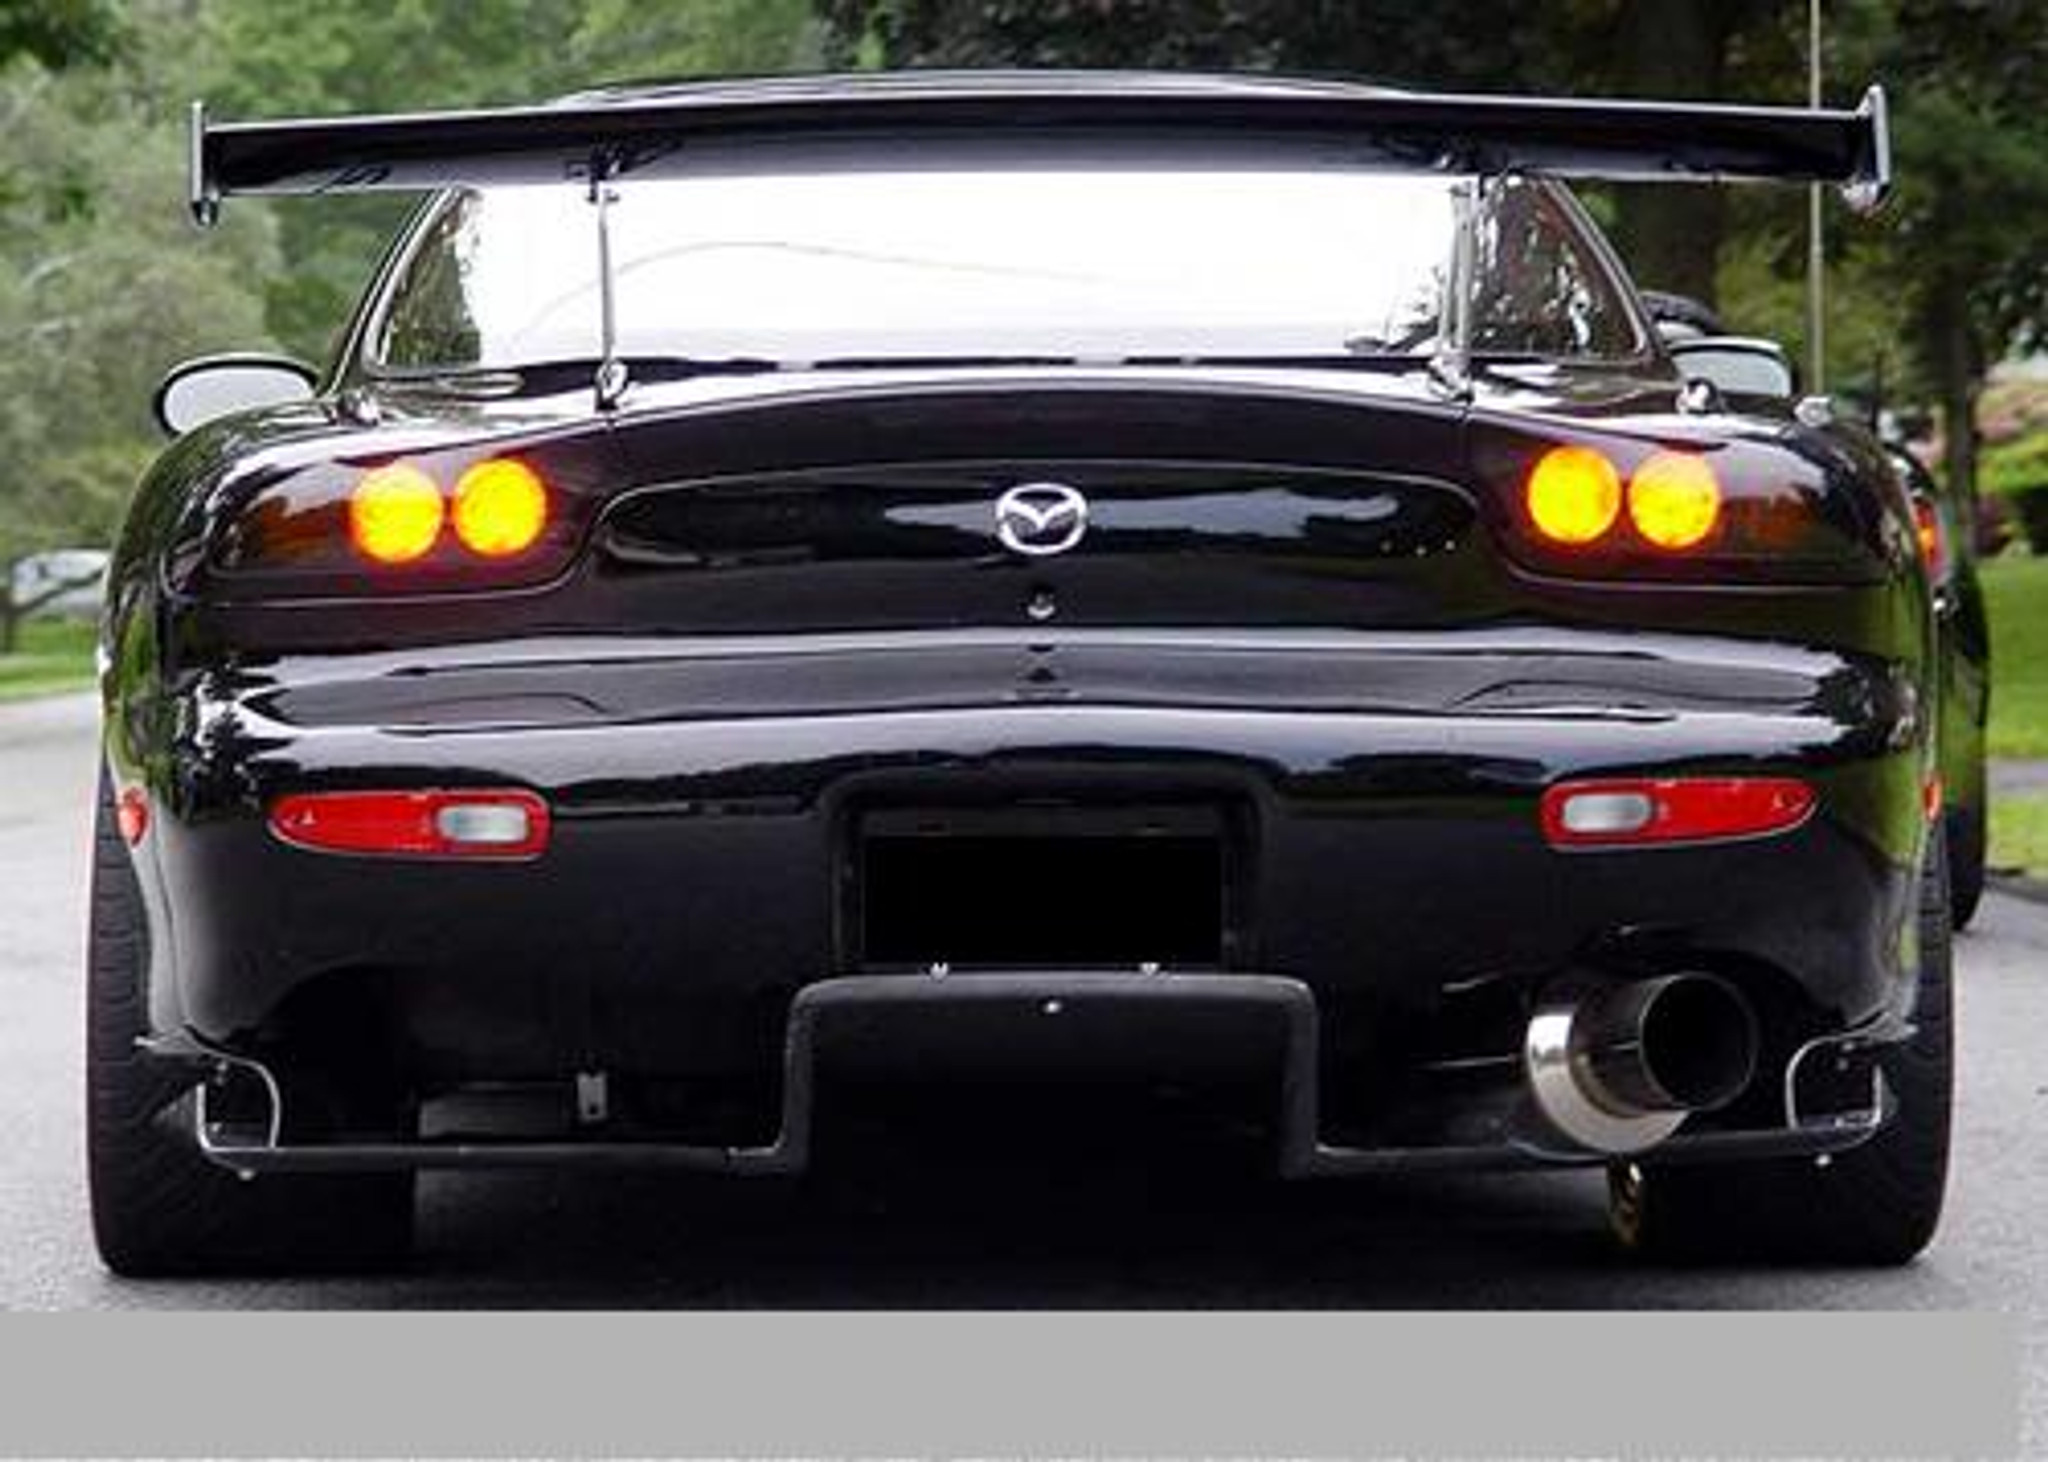 Mazda RX7 FD3S Black GRP Rear Diffuser Body Kit